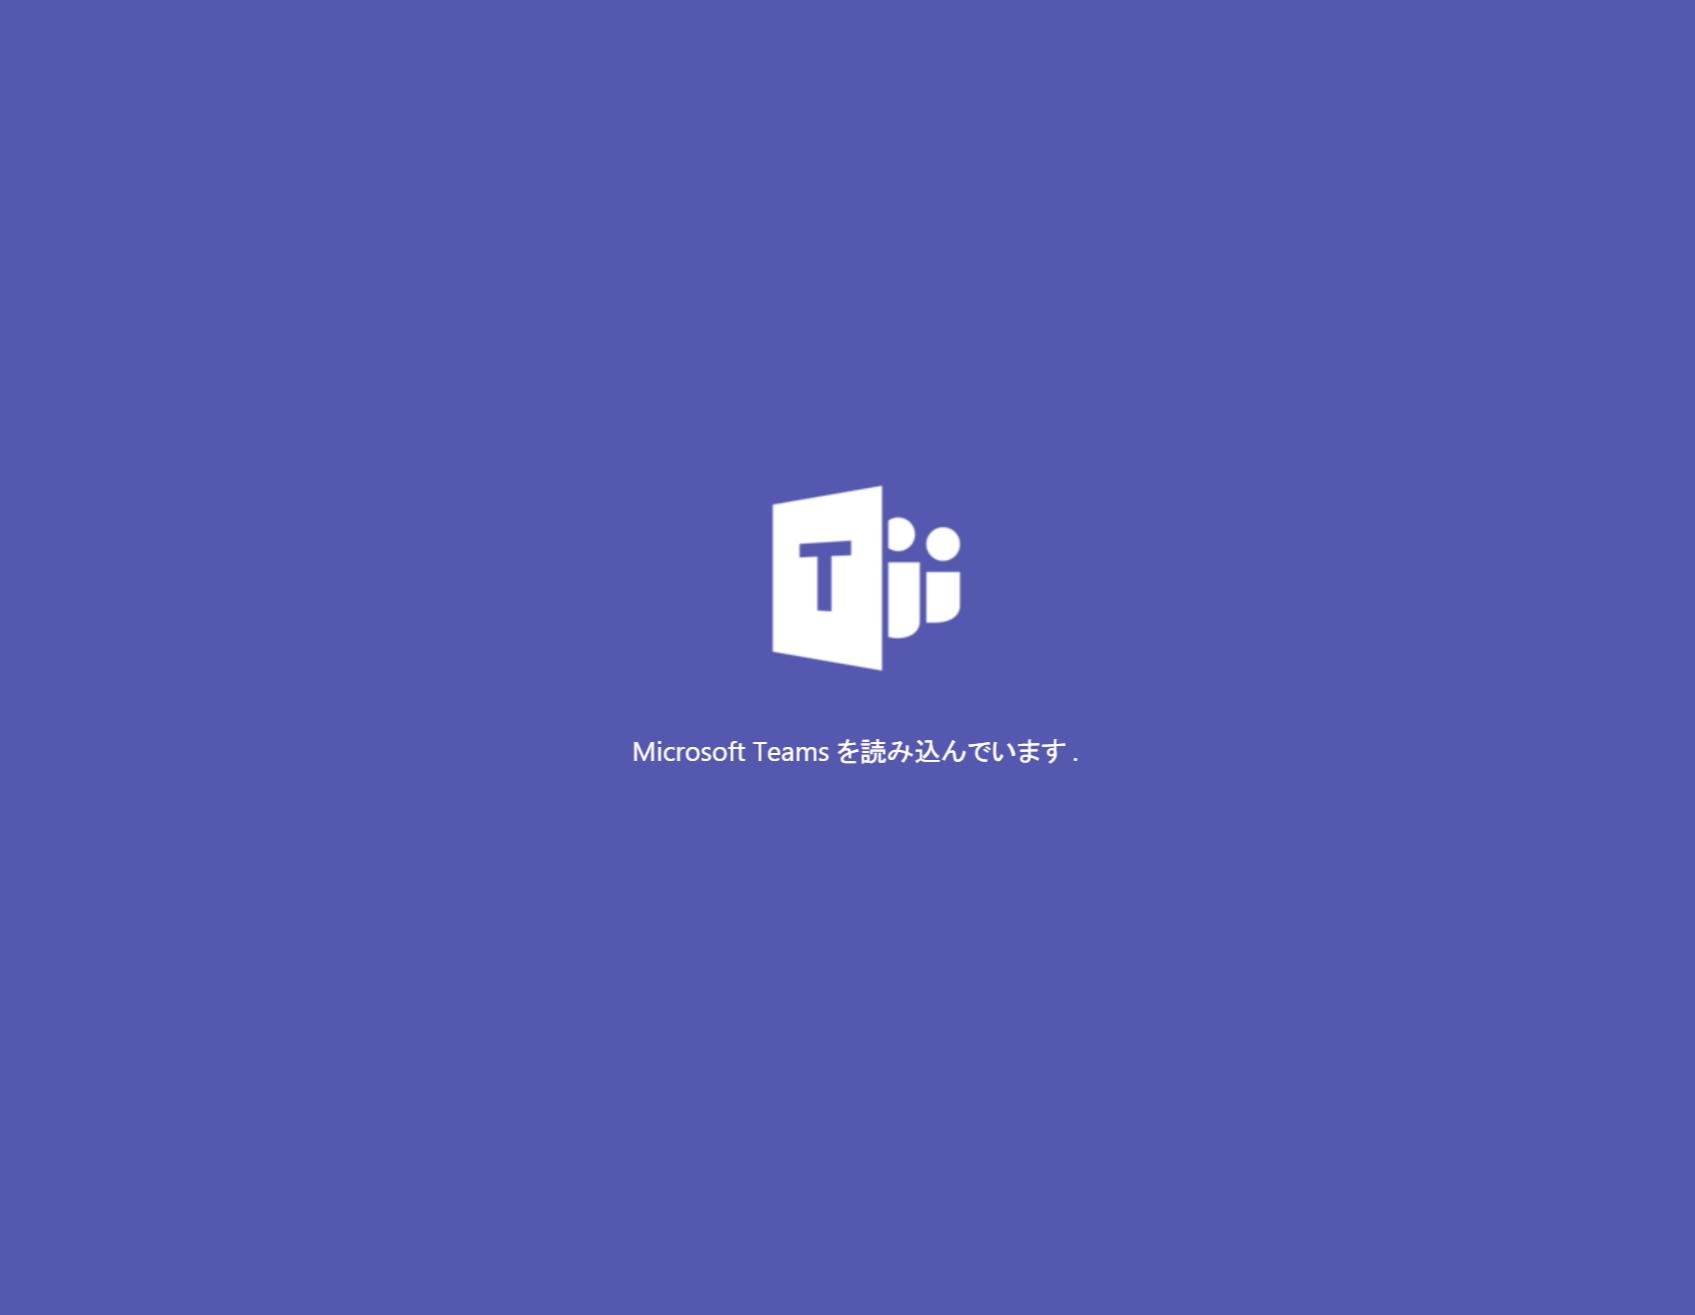 Microsoft Teams ファーストインプレッション!検索最近の投稿カテゴリー